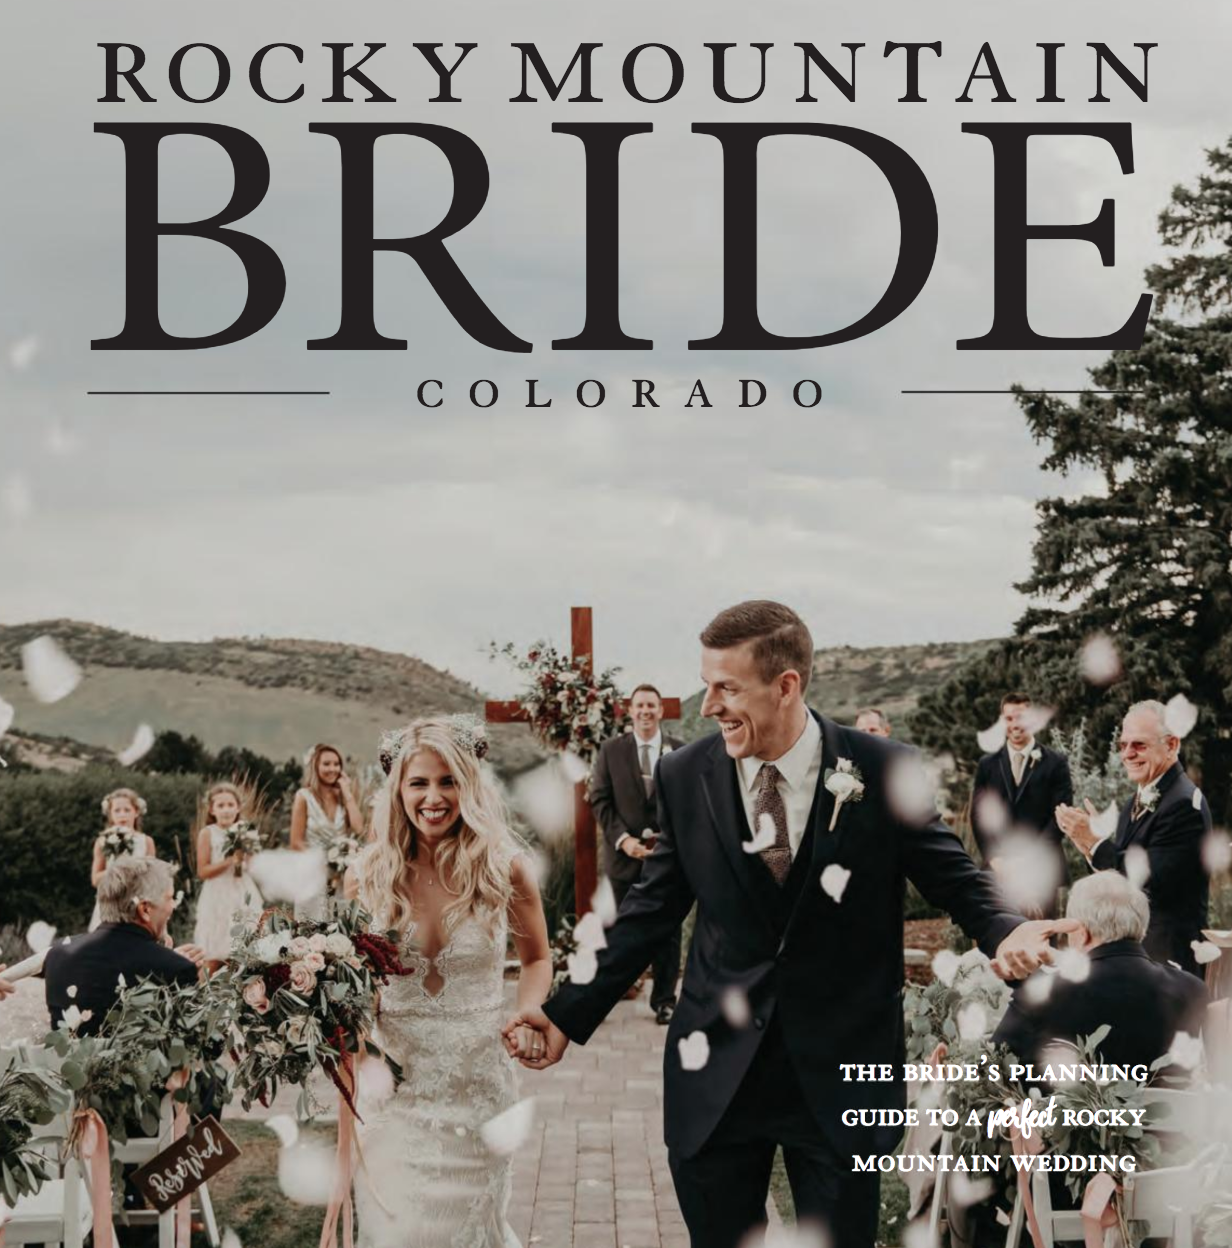 In The Press: Rocky Mountain Bride